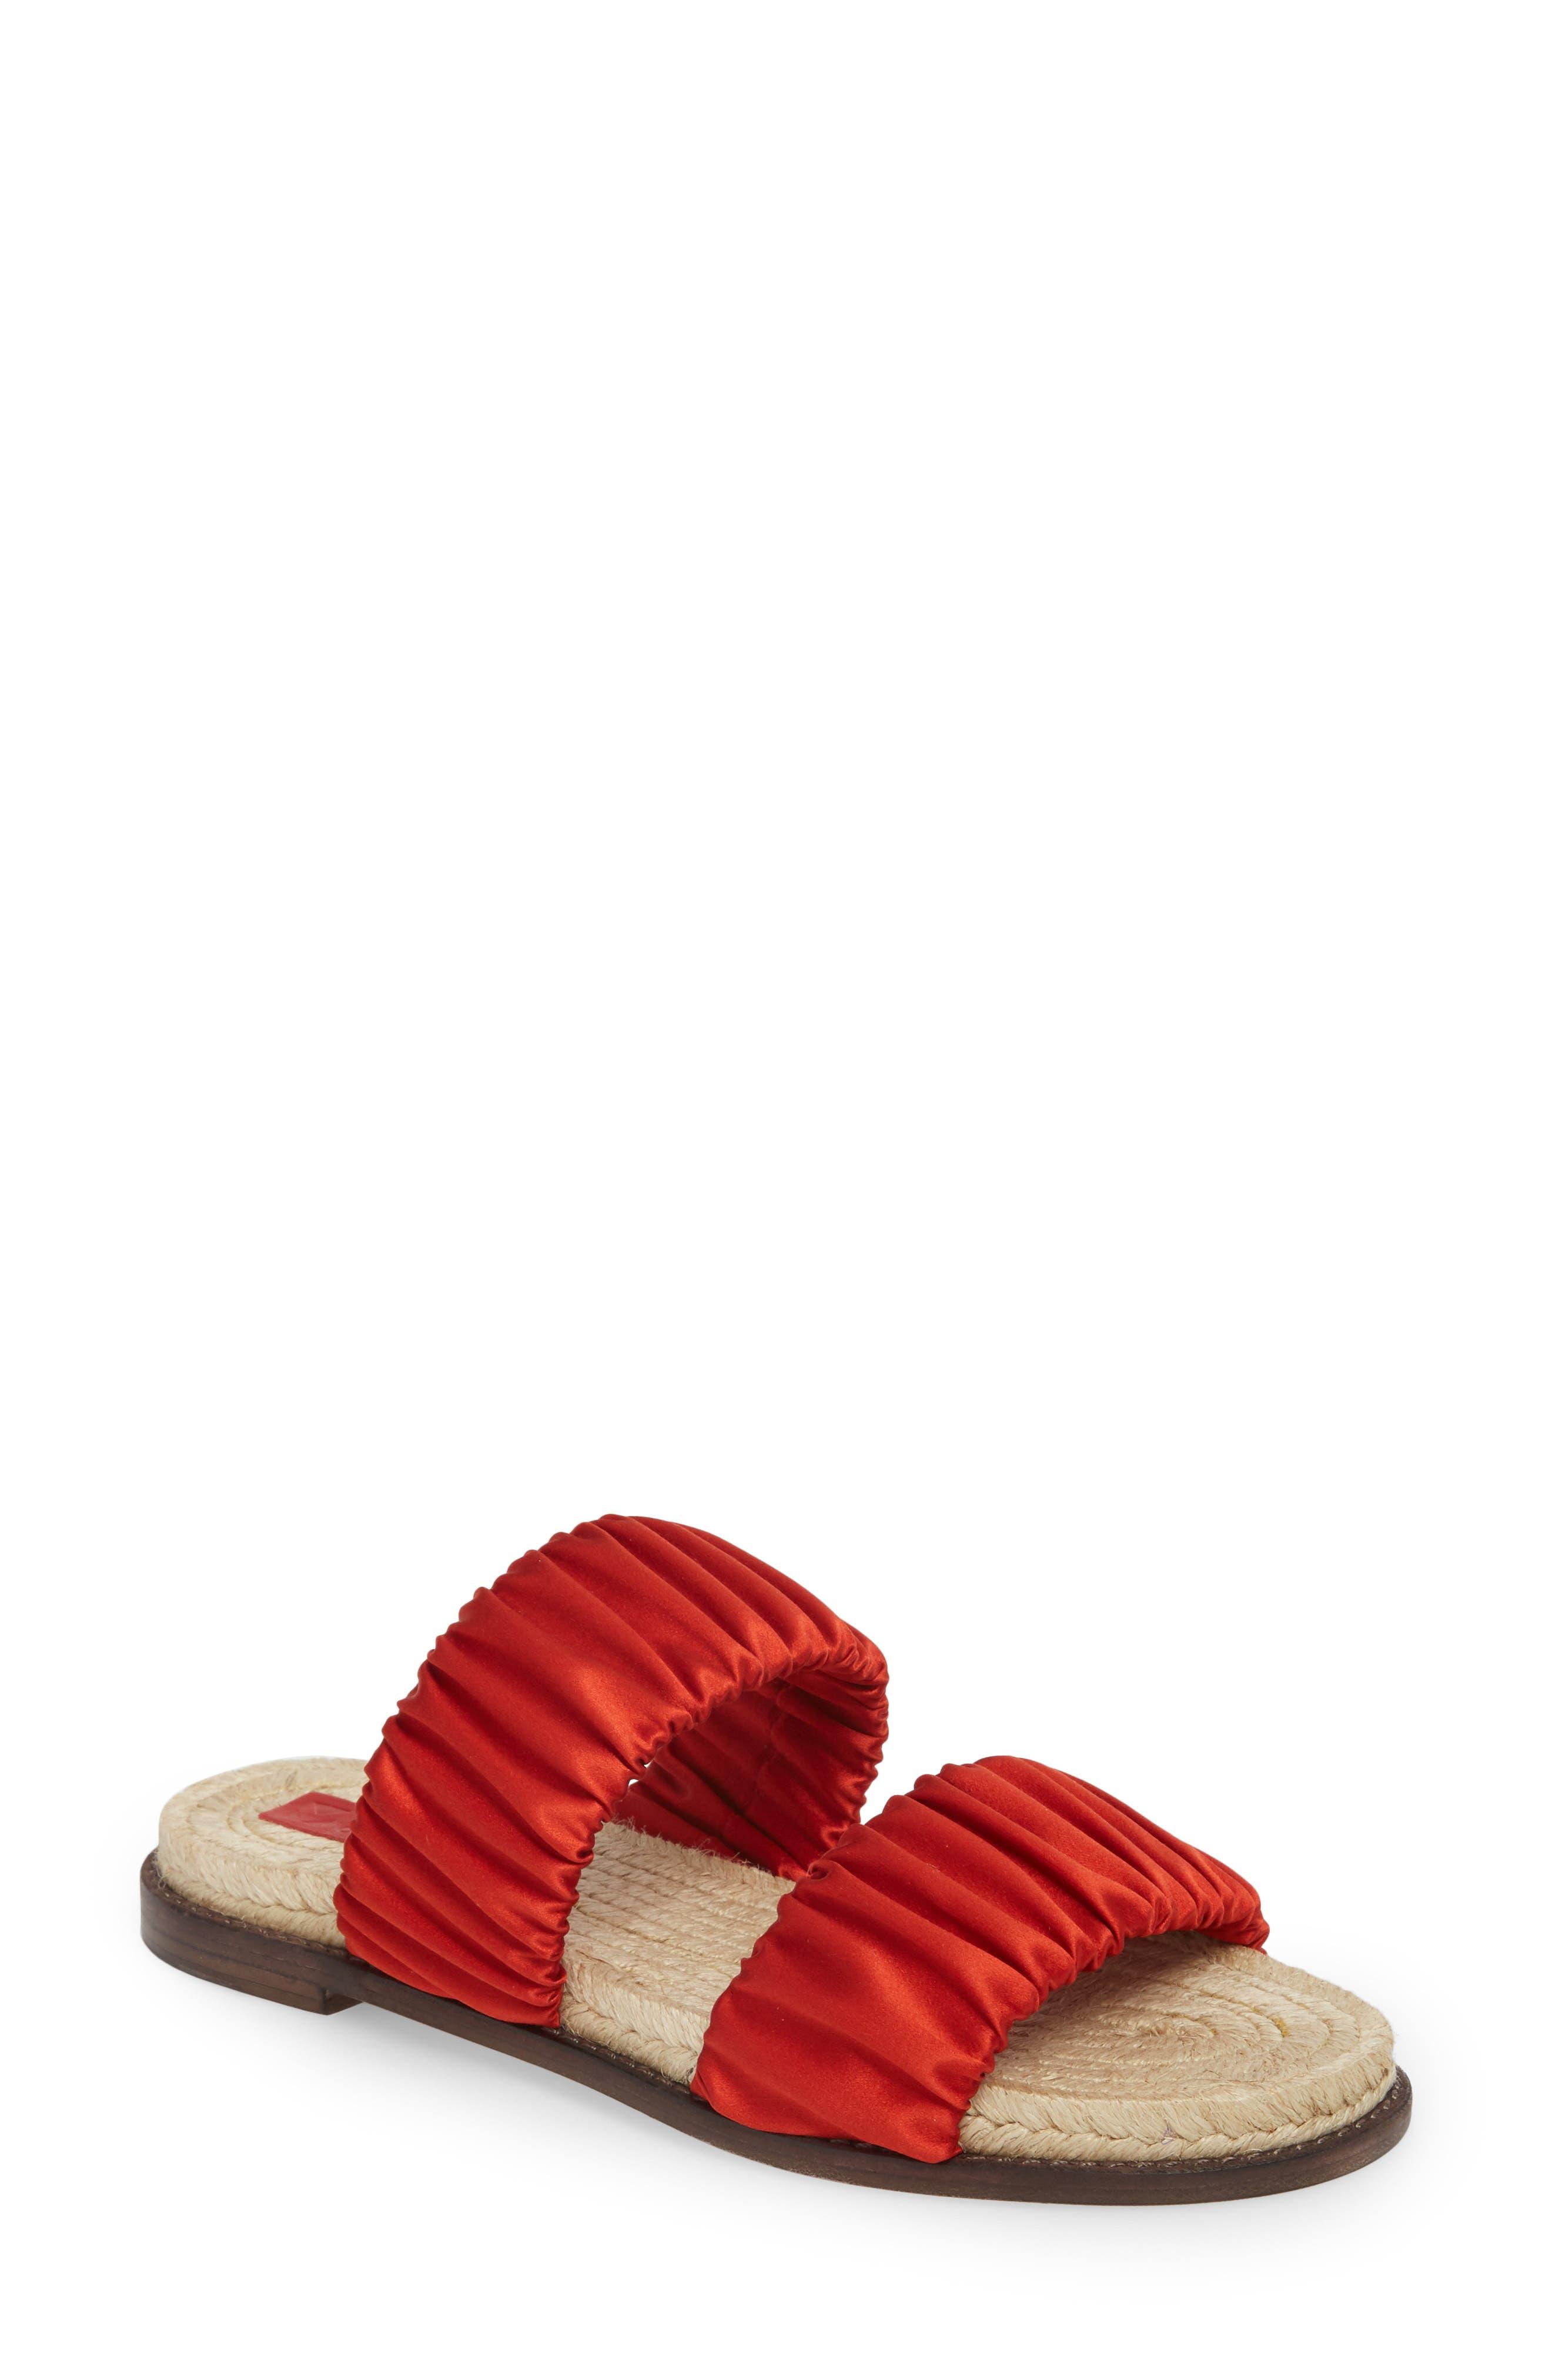 Espadrille Sandal,                         Main,                         color, Red Tulip